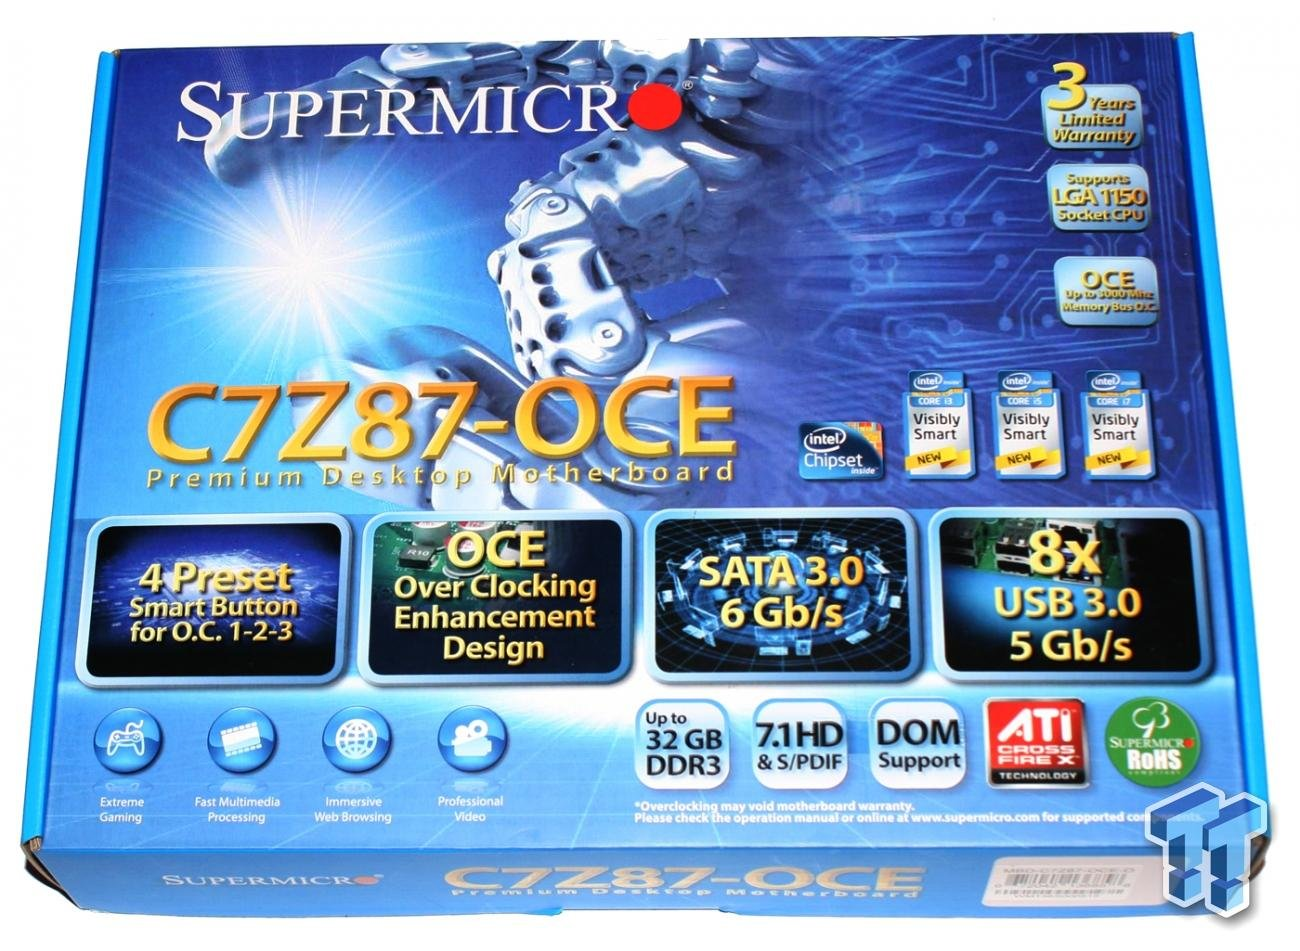 Supermicro C7Z87-OCE